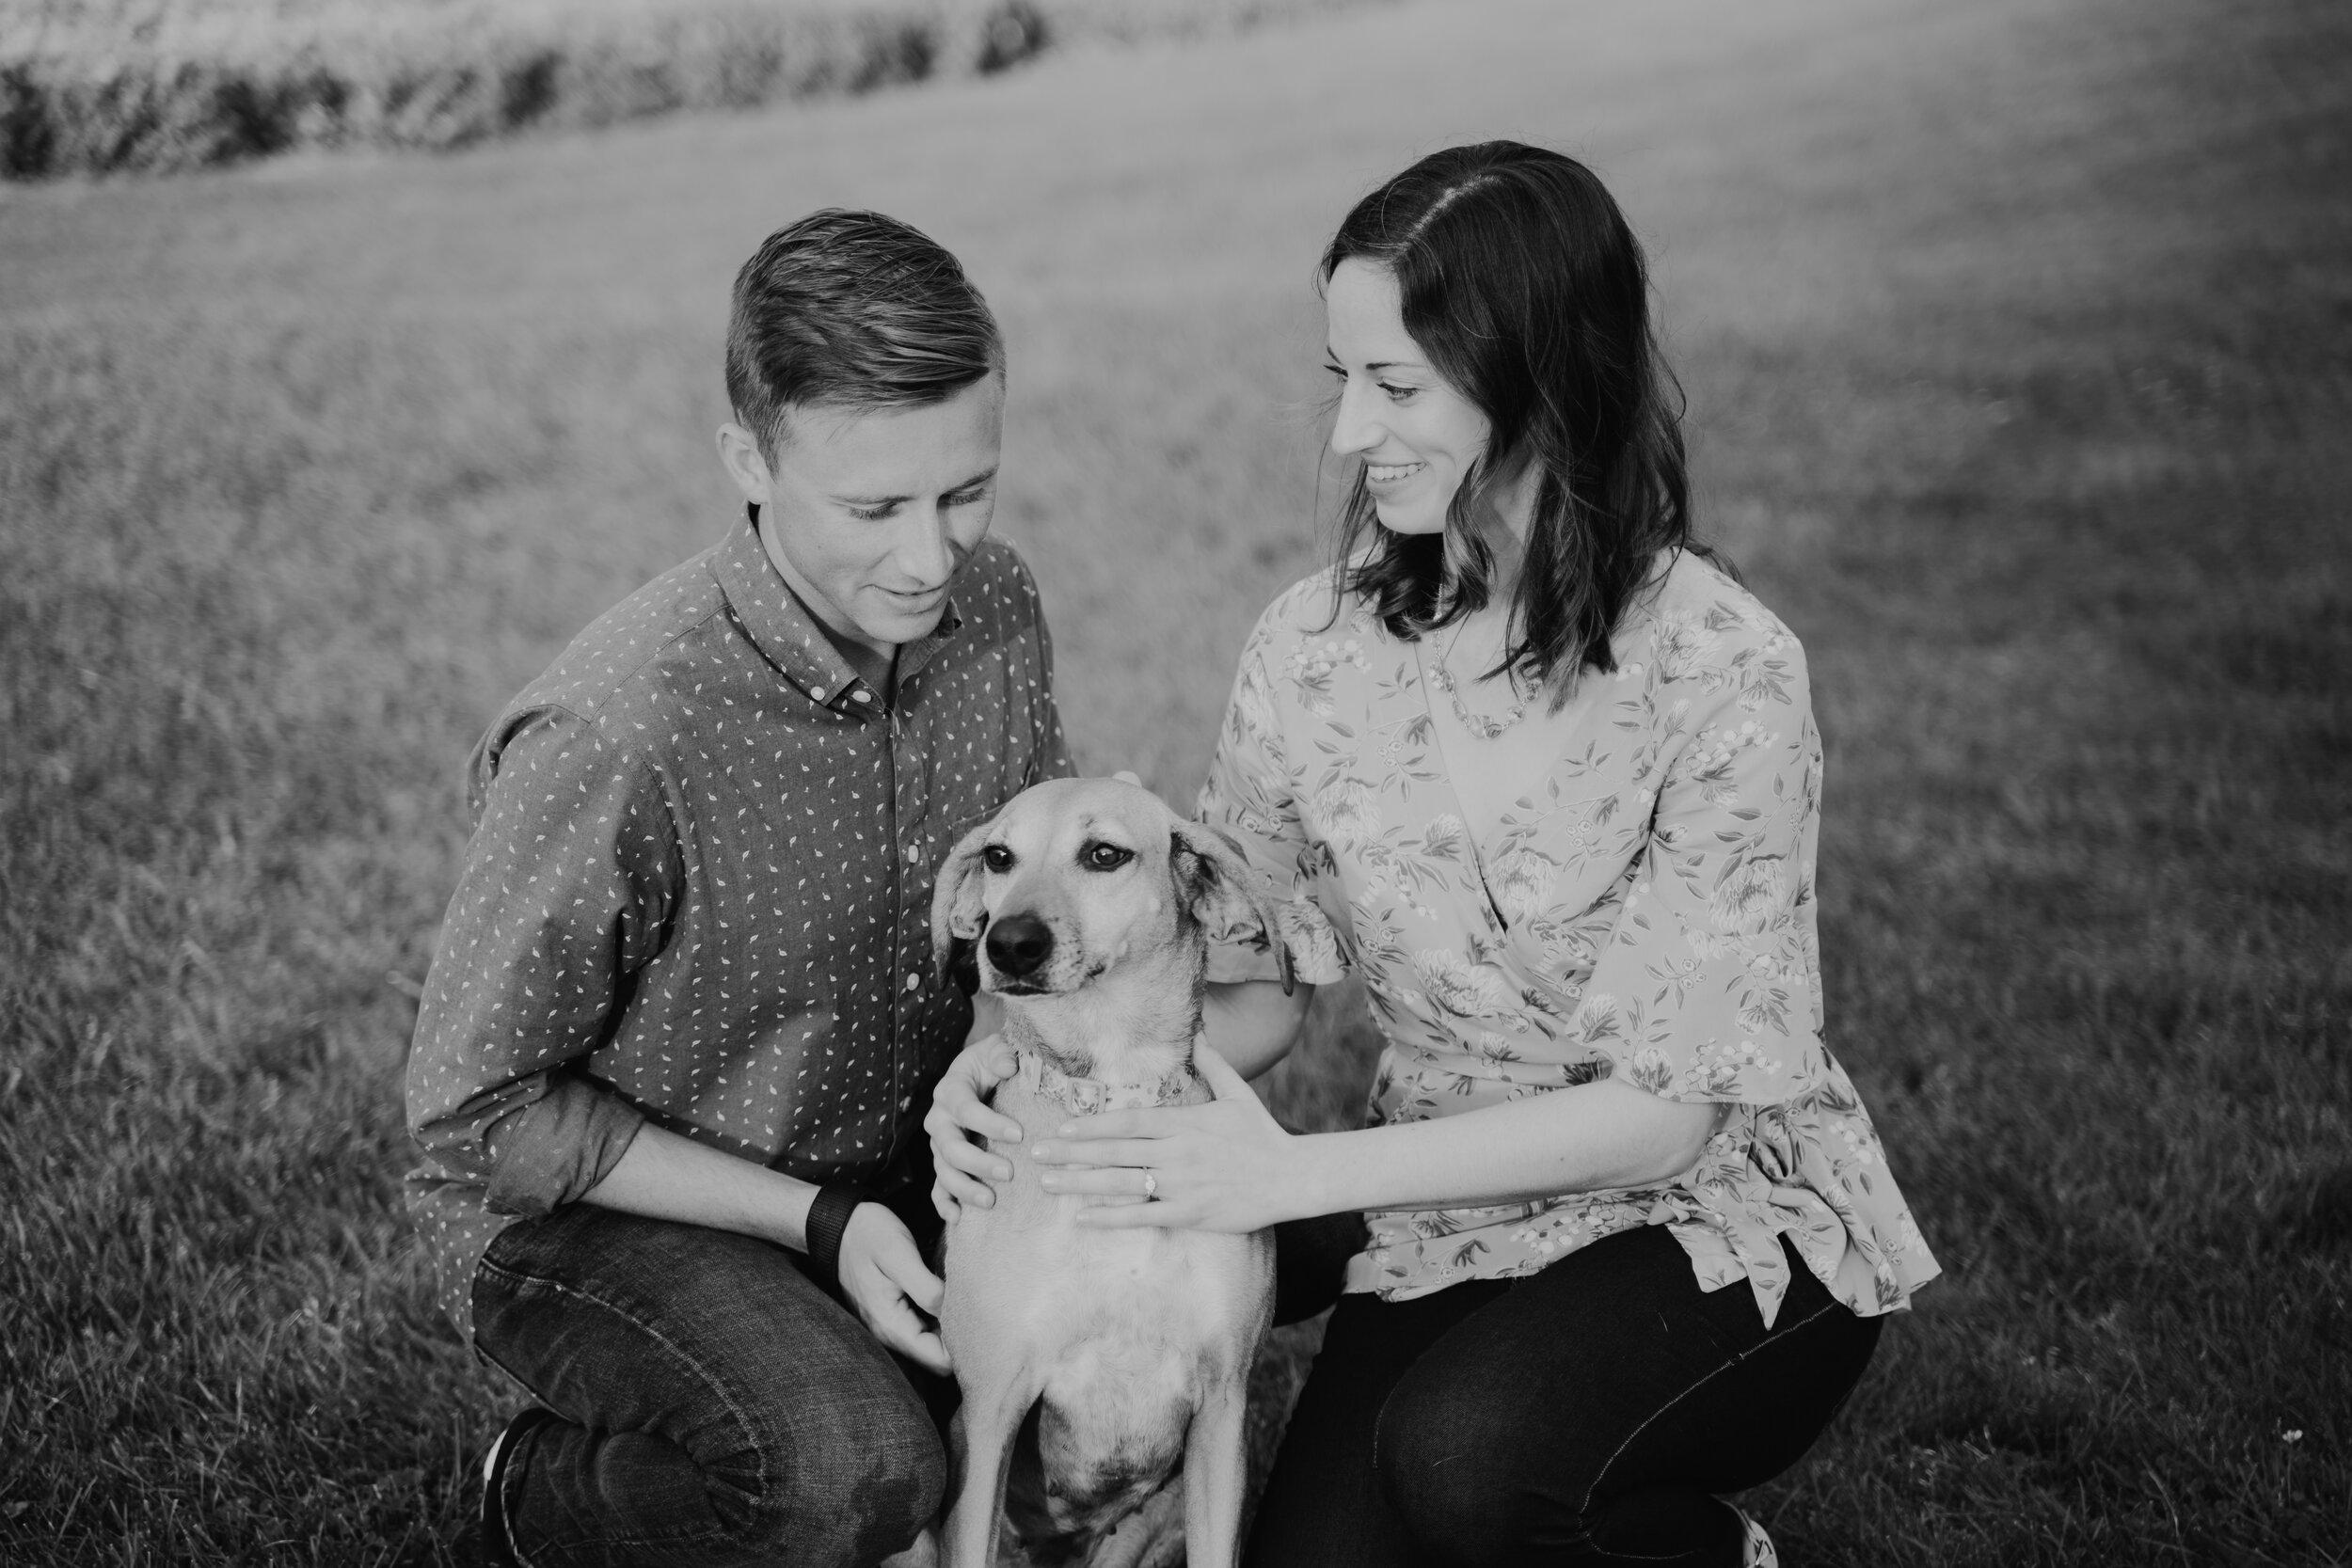 Erin & Jeff Engagement Photos - Datflipmel Photo & Films-06395.jpg